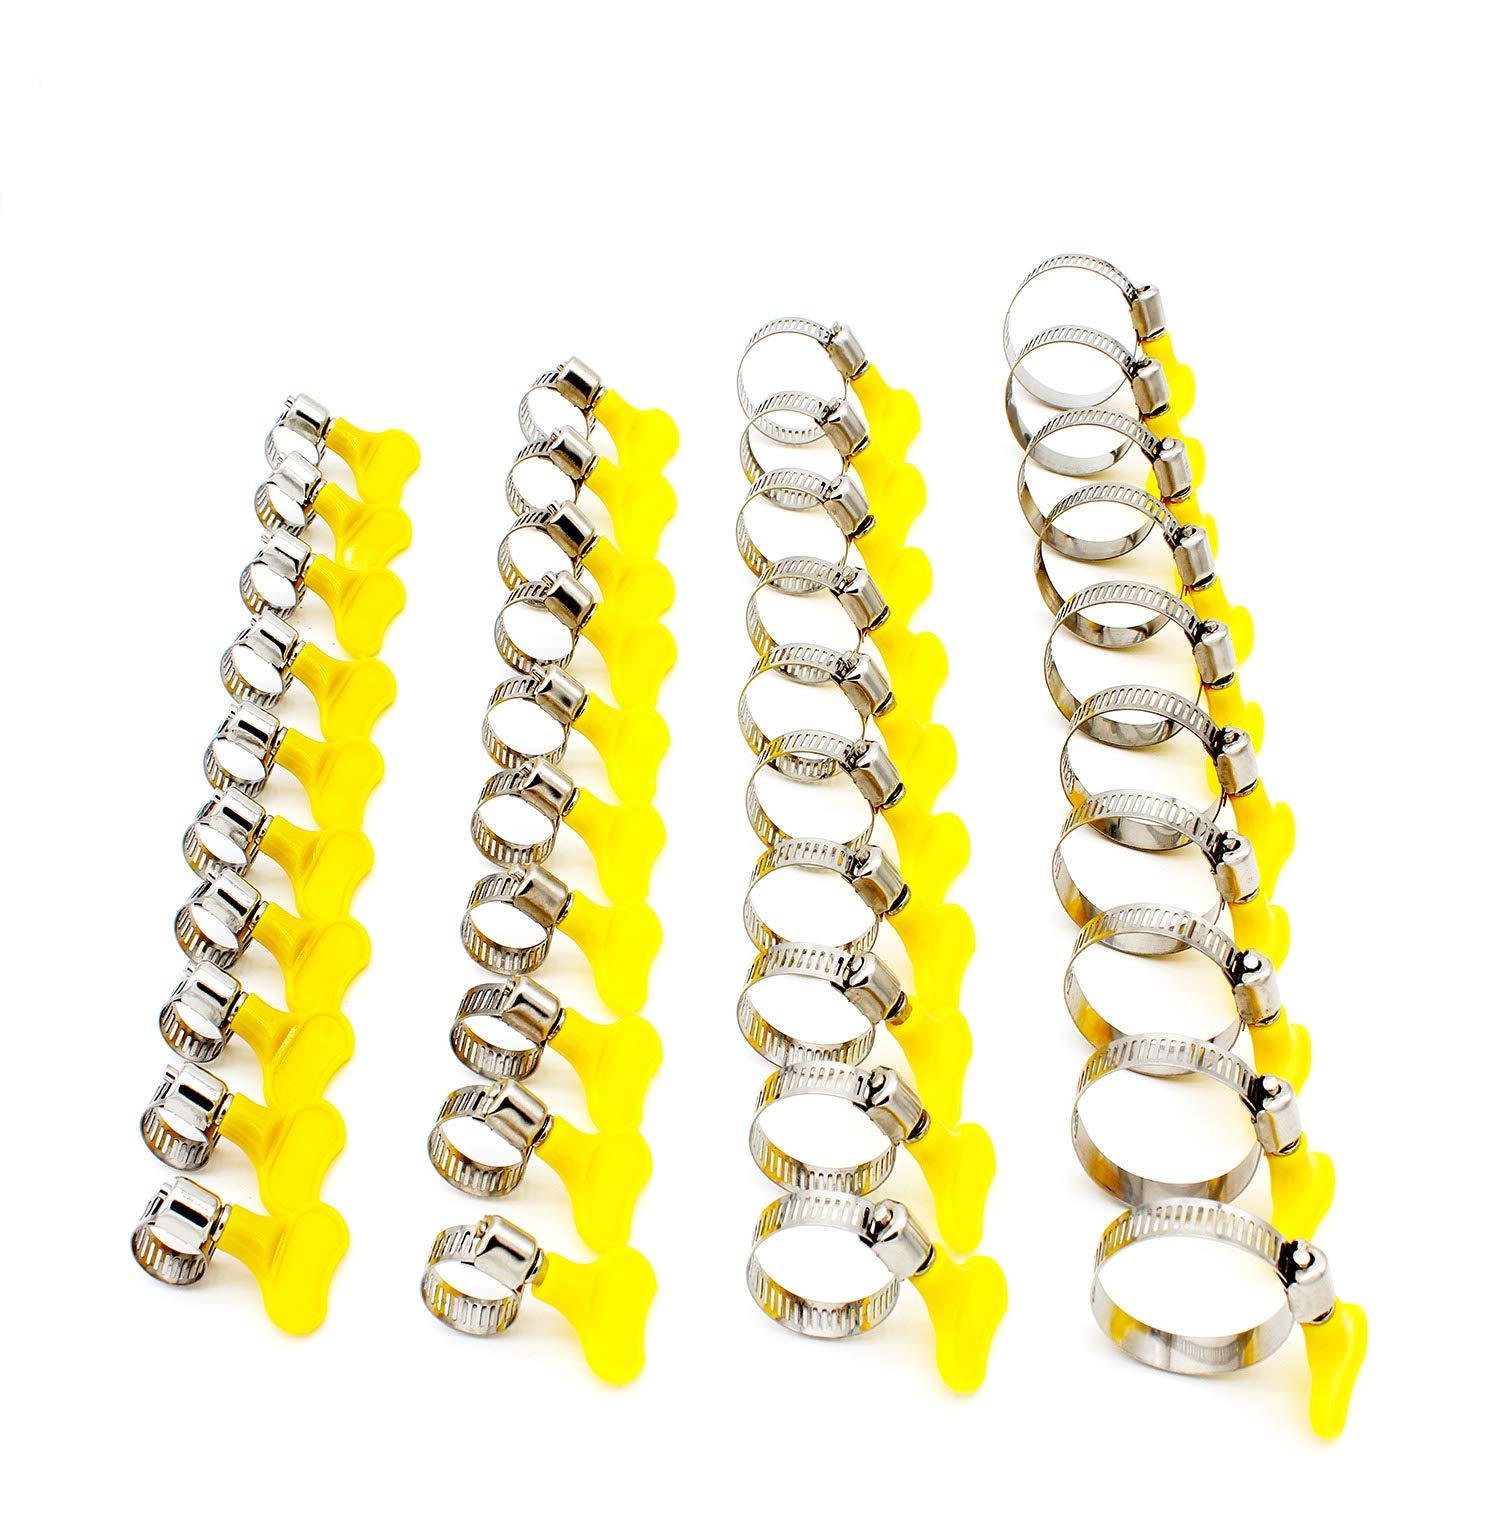 TSellk Adjustable Stainless Steel Hose Clamp, Pipe Clamp, Self-Bringing Tools, 1/3'' - 1 1/2'', 40 Piece